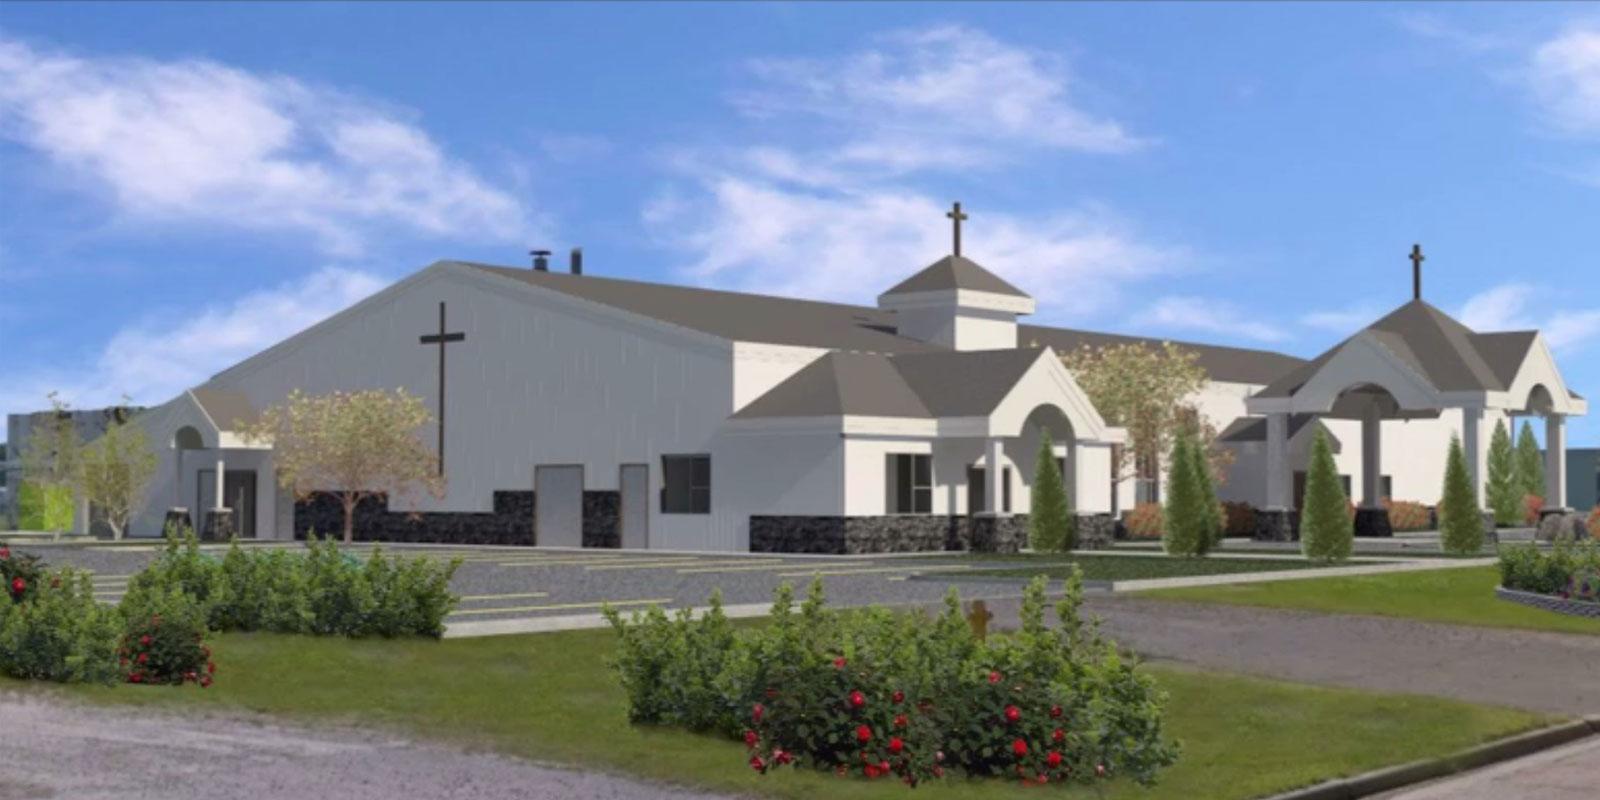 First Baptist of Smoky Lake